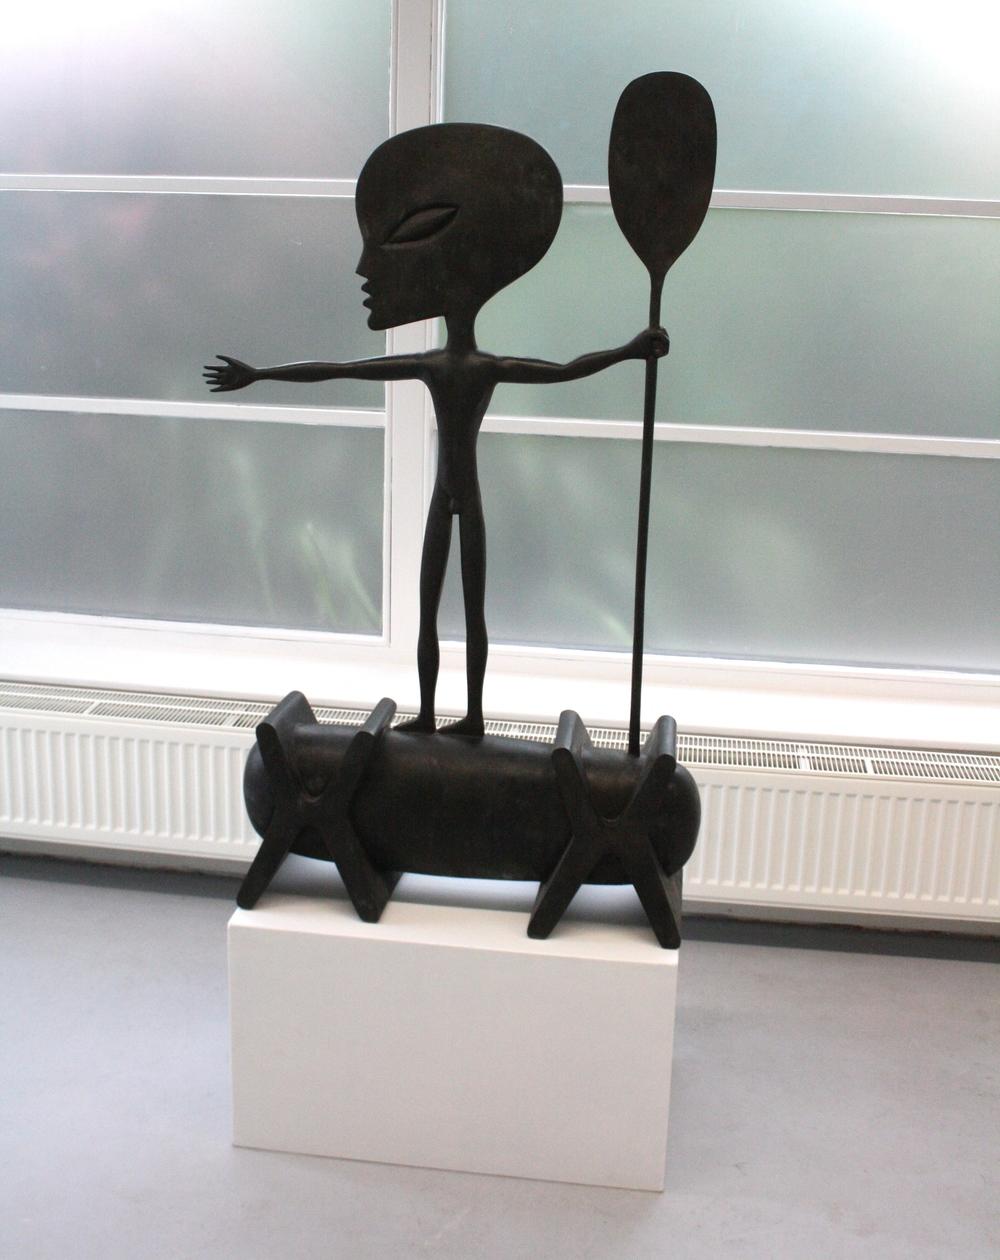 Jaroslav Róna, Africký plavec, 2011, 131 x 77 x 26,5 cm, bronz